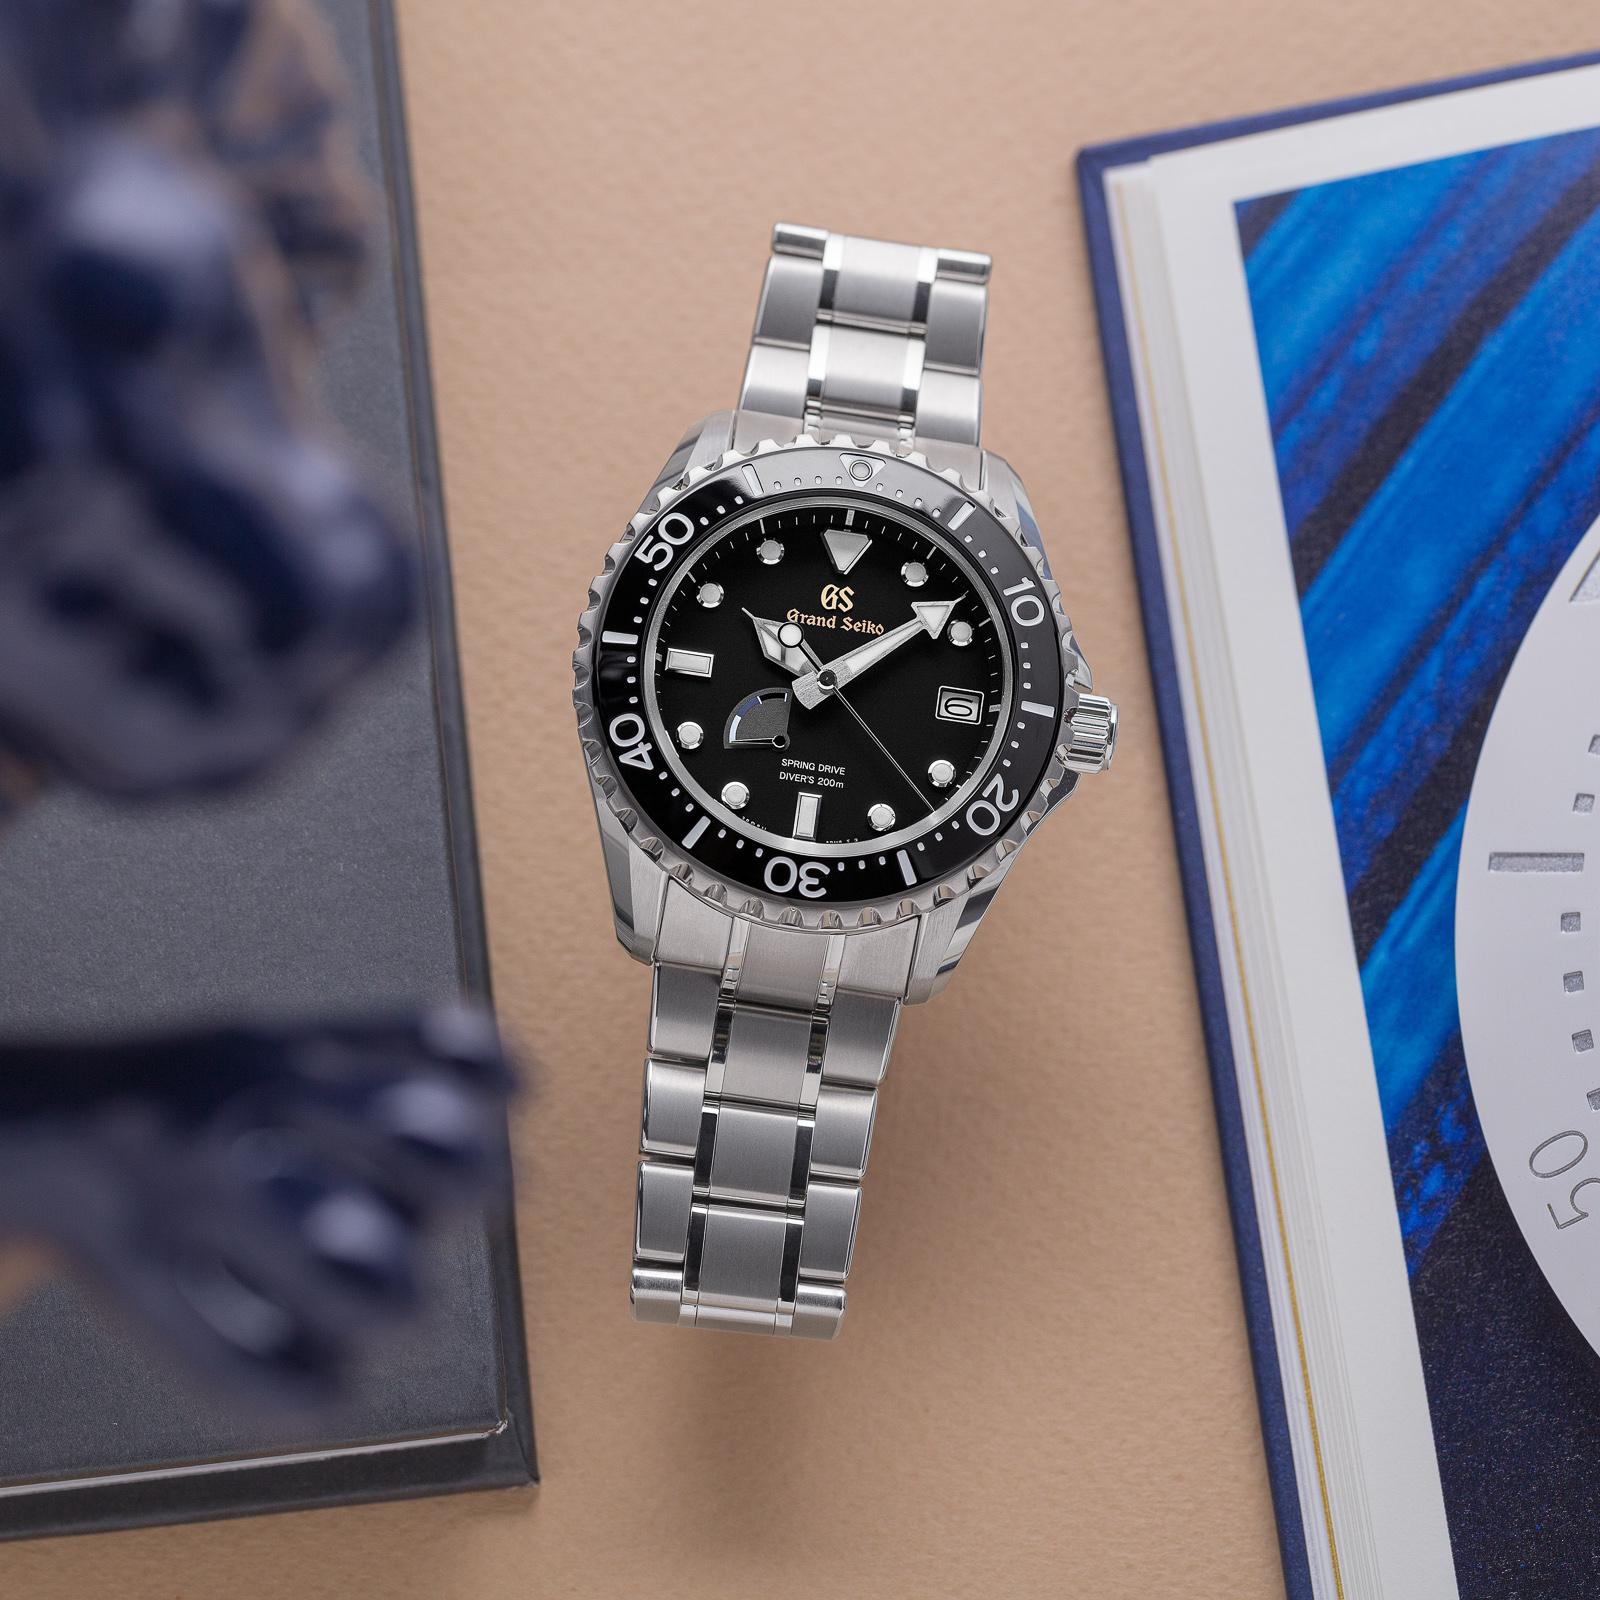 Grand Seiko SBGA231 wristwatch - a titanium cased, black dial diver atop a brown table.